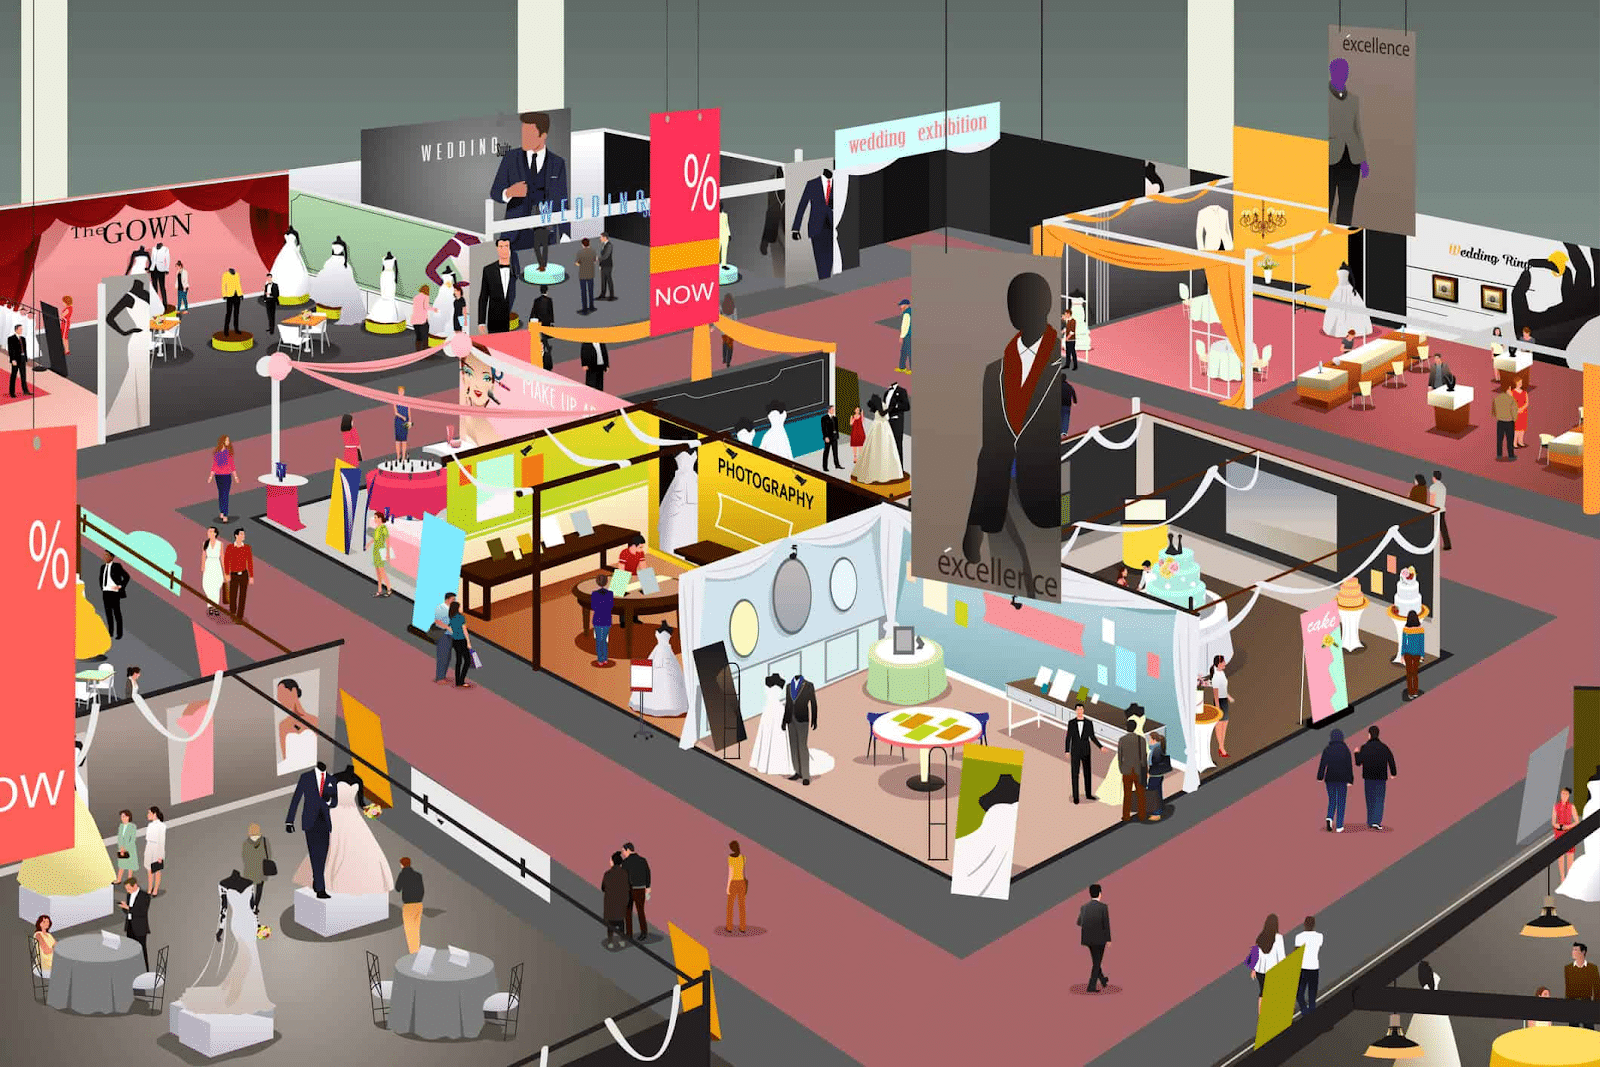 Foires expositions mode